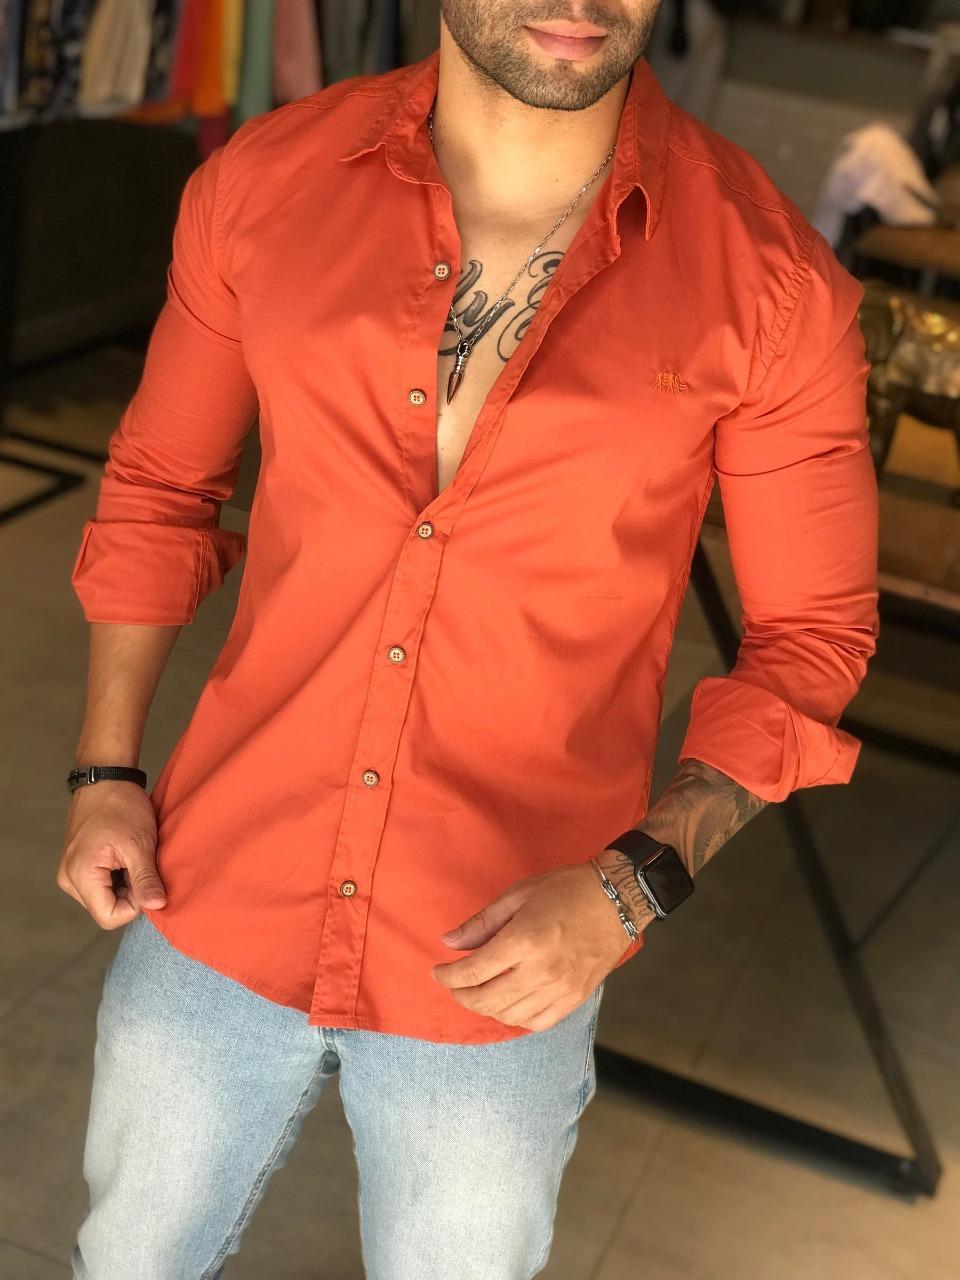 Camisa Social Slim M Artt Laranja Queimado  - Harpia Moda - Moda Masculina & Acessórios